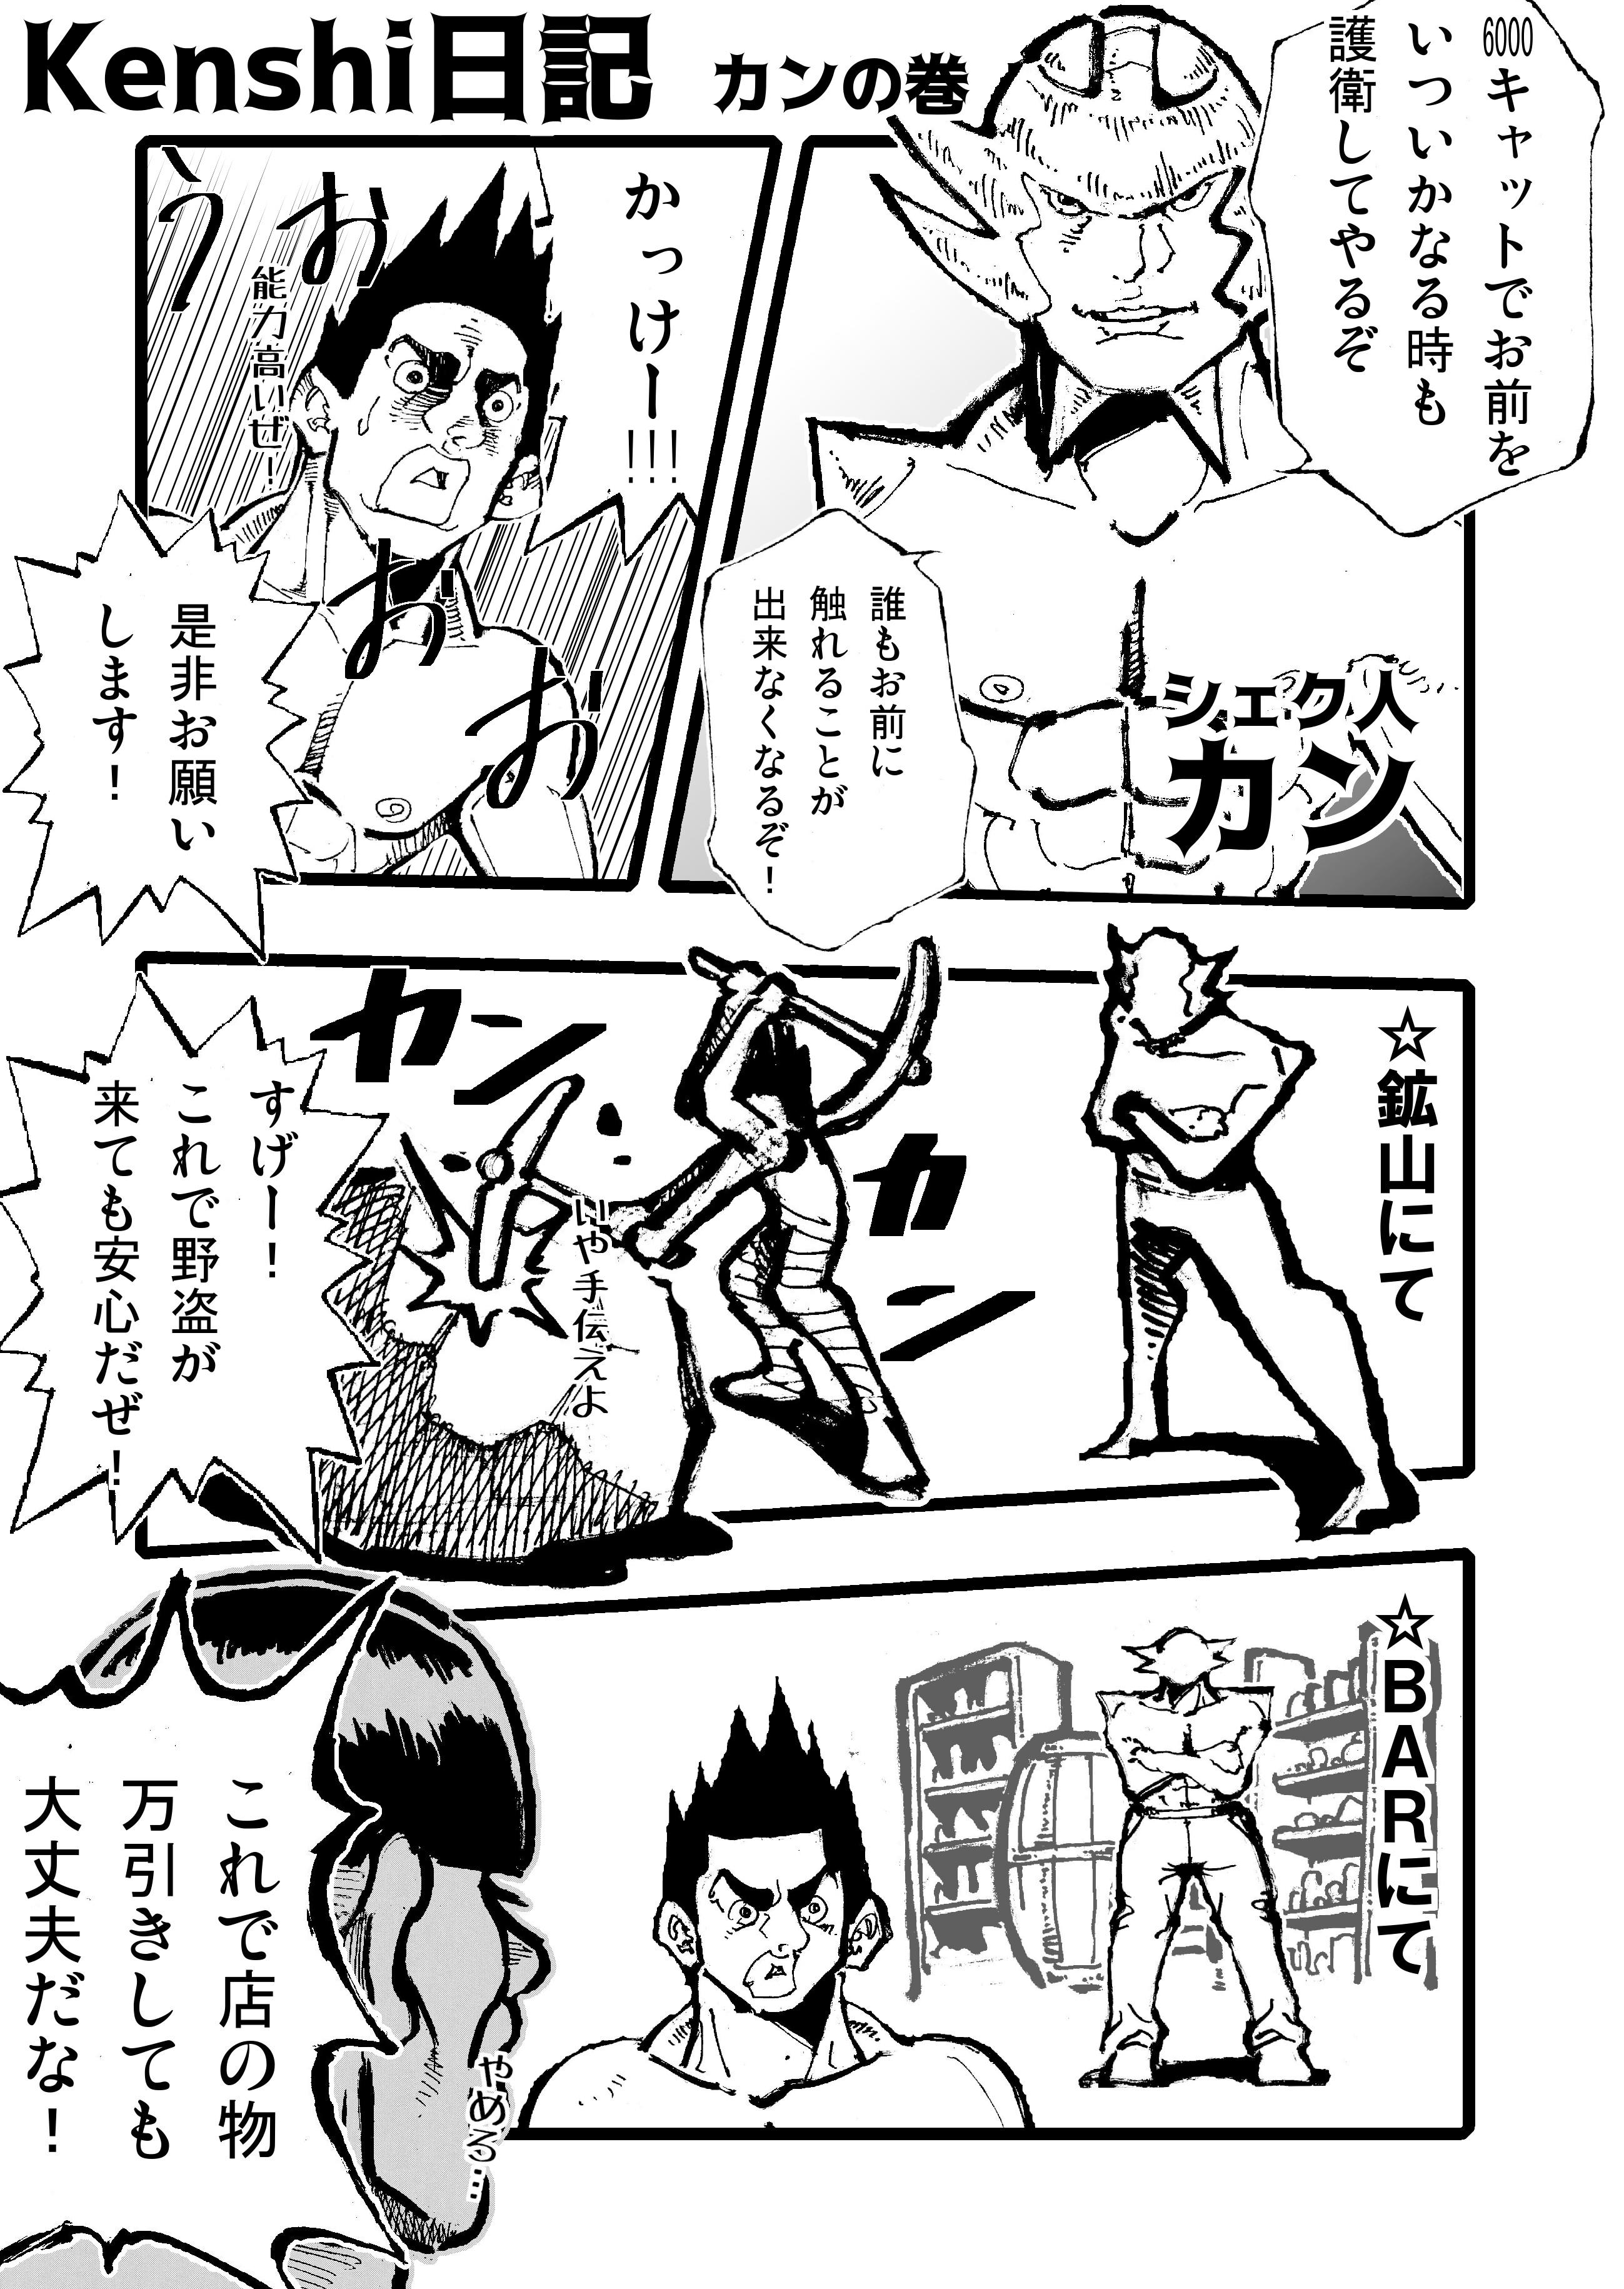 Kenshi日記9 カンの巻/Kenshi日記10 ヴォスの巻